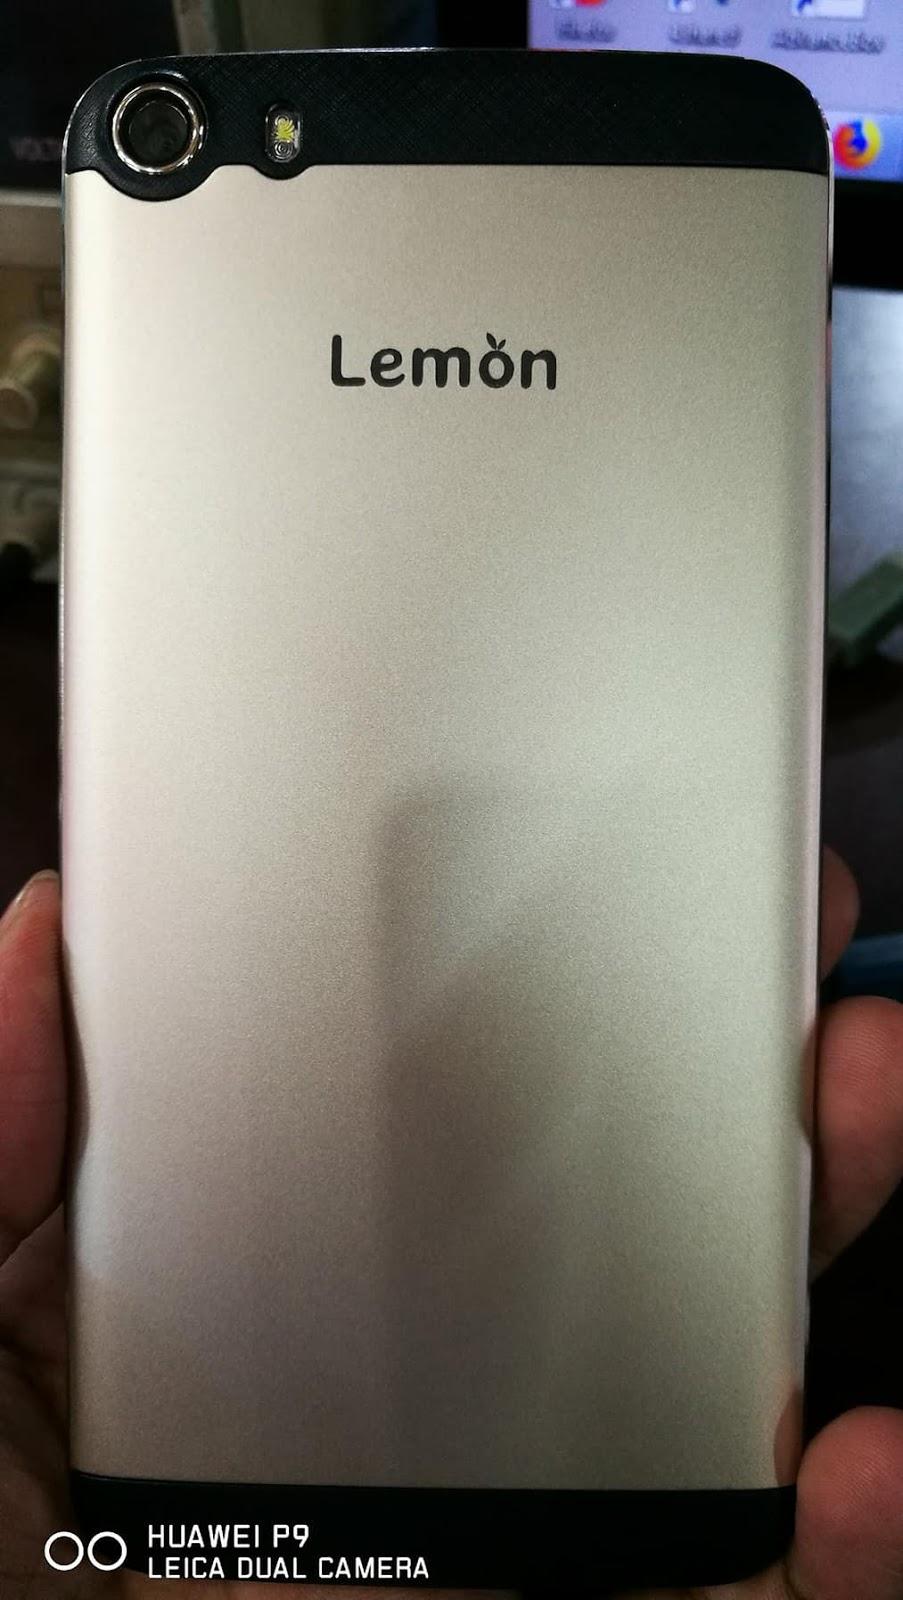 MT6580__XFS__S1__w825_648_ax_xfs_jh008_lemon__5.1__w825_648_ax_xfs_jh008_lemon_v1.9